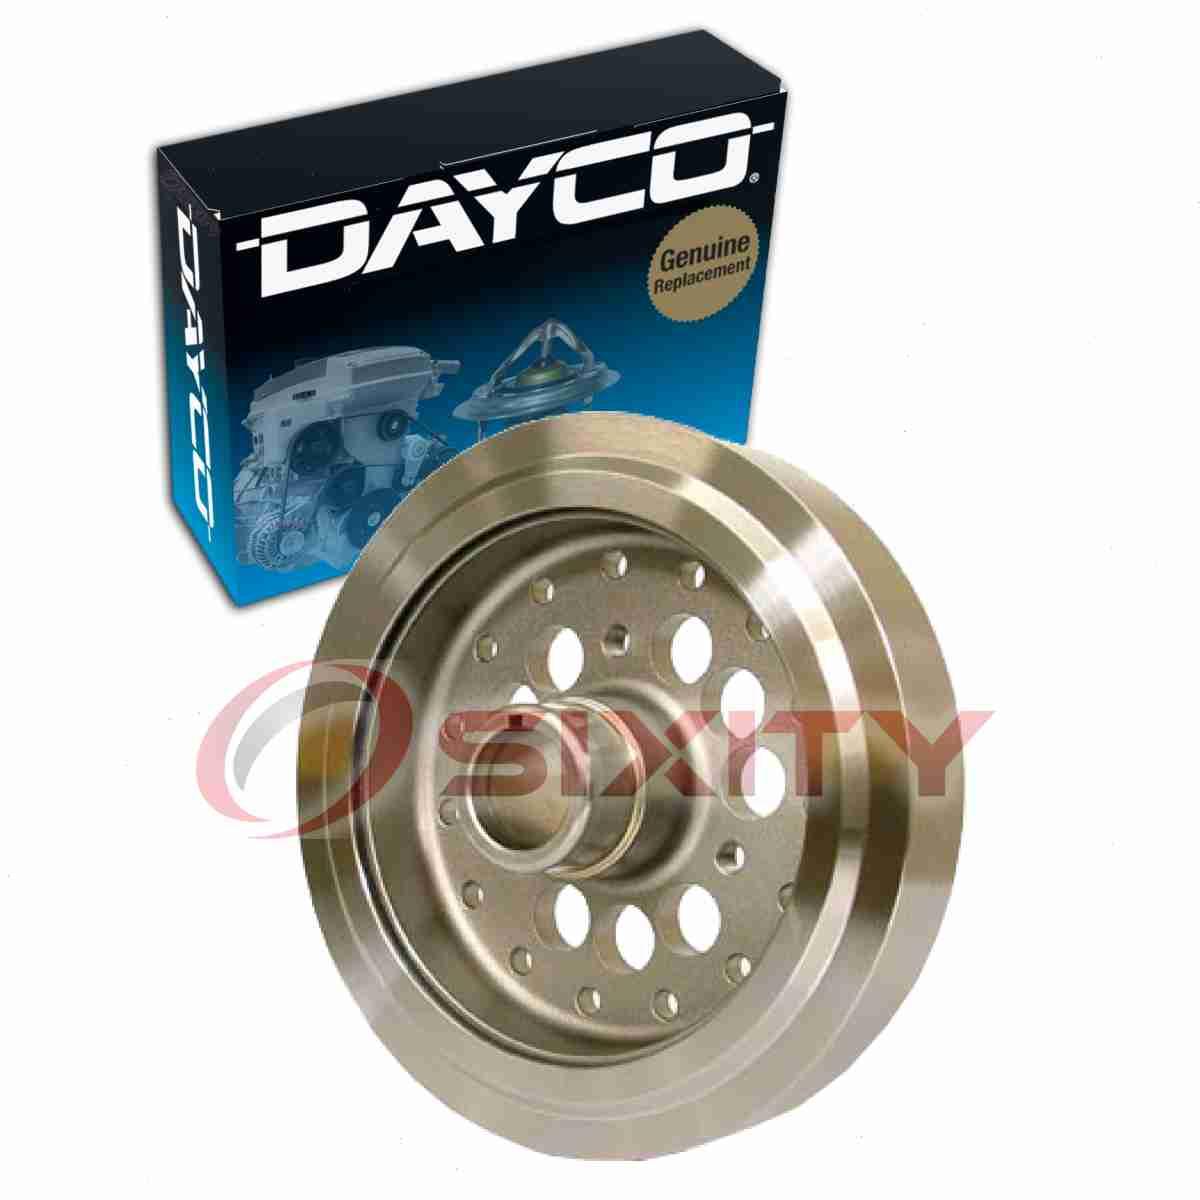 Dayco-PB1046SS-Powerbond-Race-Harmonic-Balancer-Engine-Crankshaft-Damper-qx